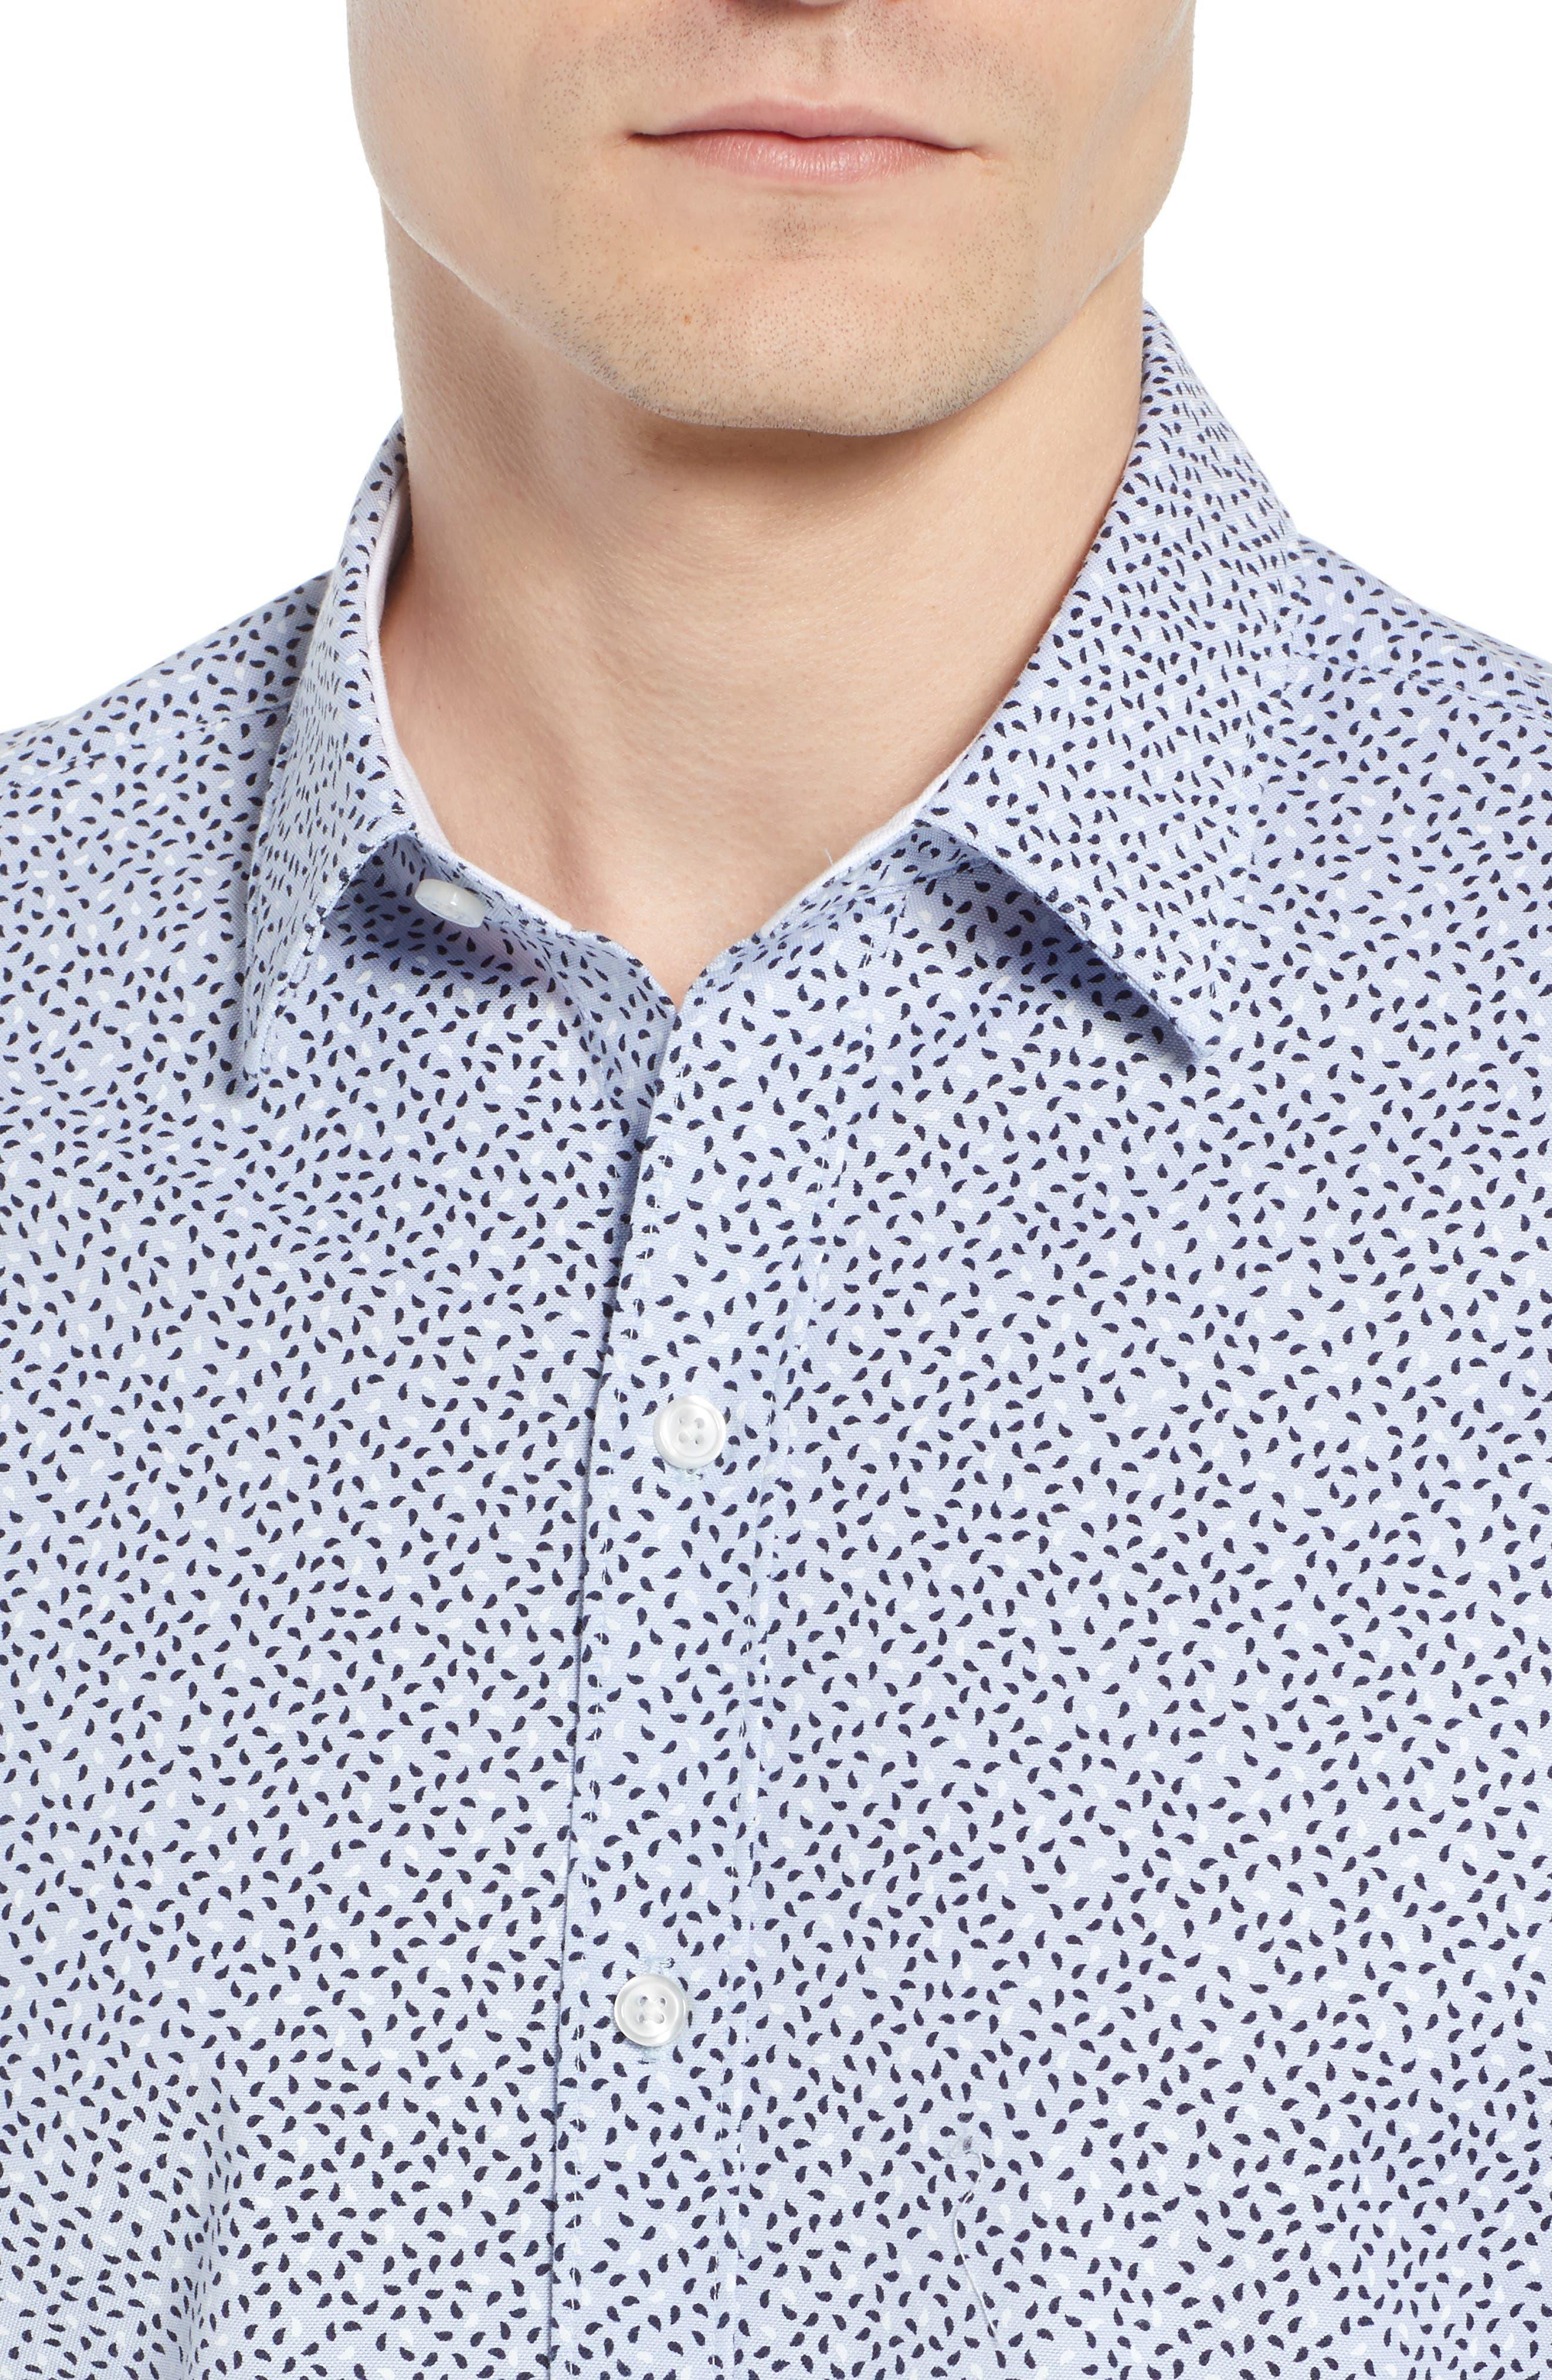 Robb Trim Fit Paisley Sport Shirt,                             Alternate thumbnail 2, color,                             Blue